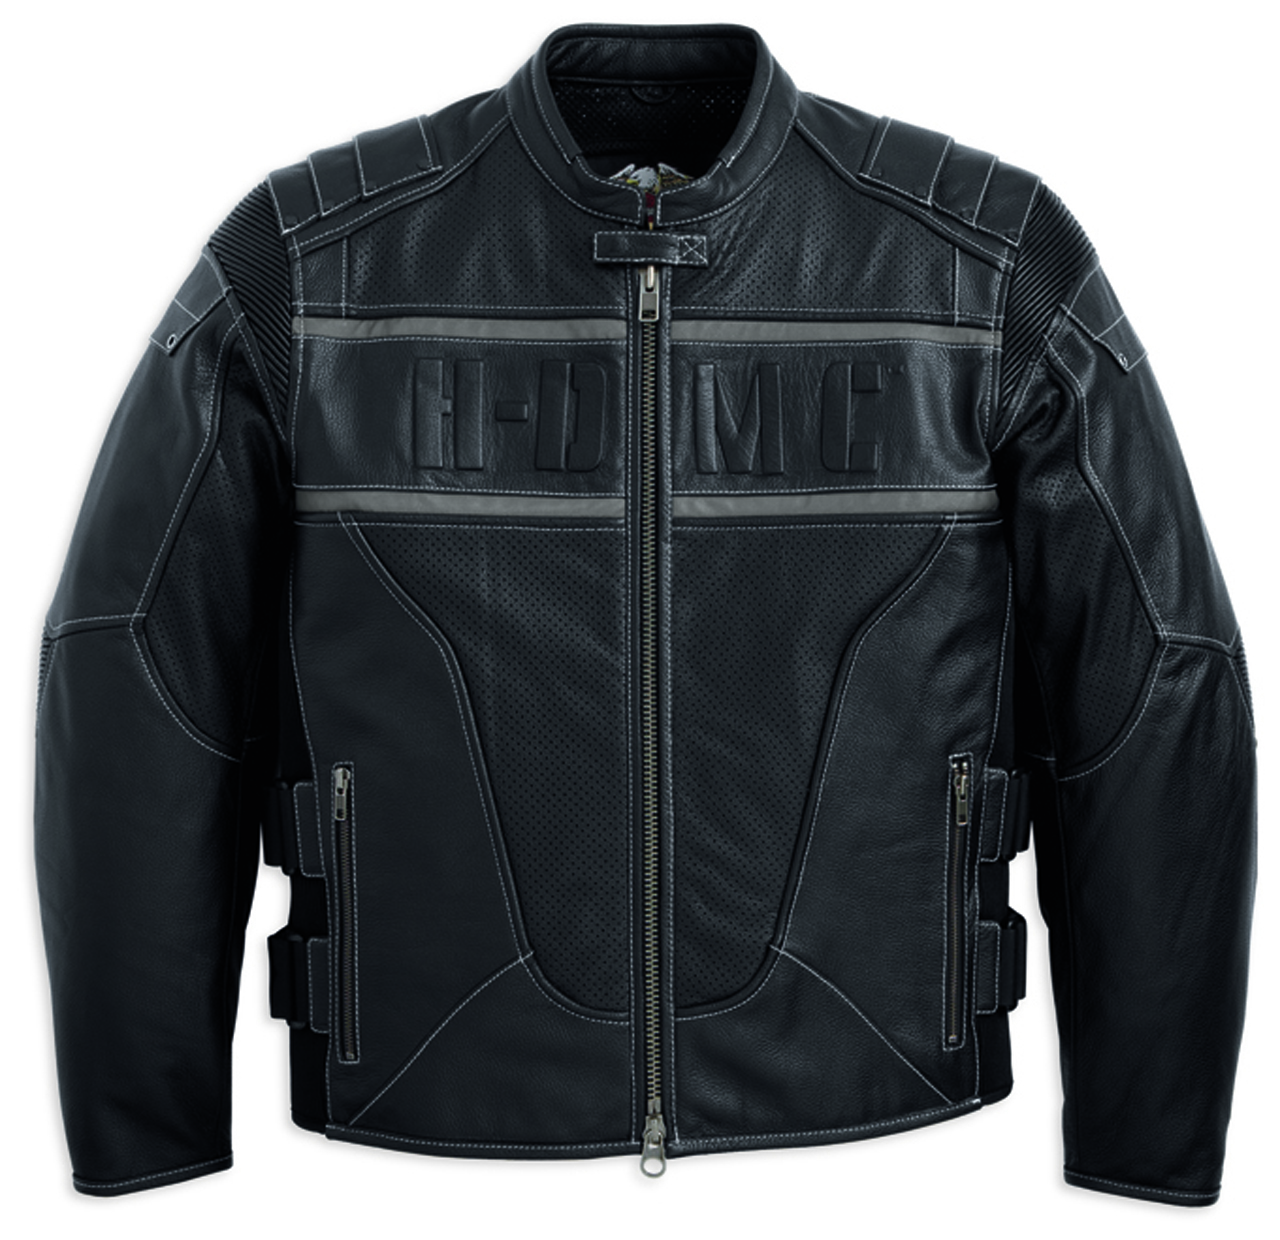 Spring 2012 - Harley Davidson